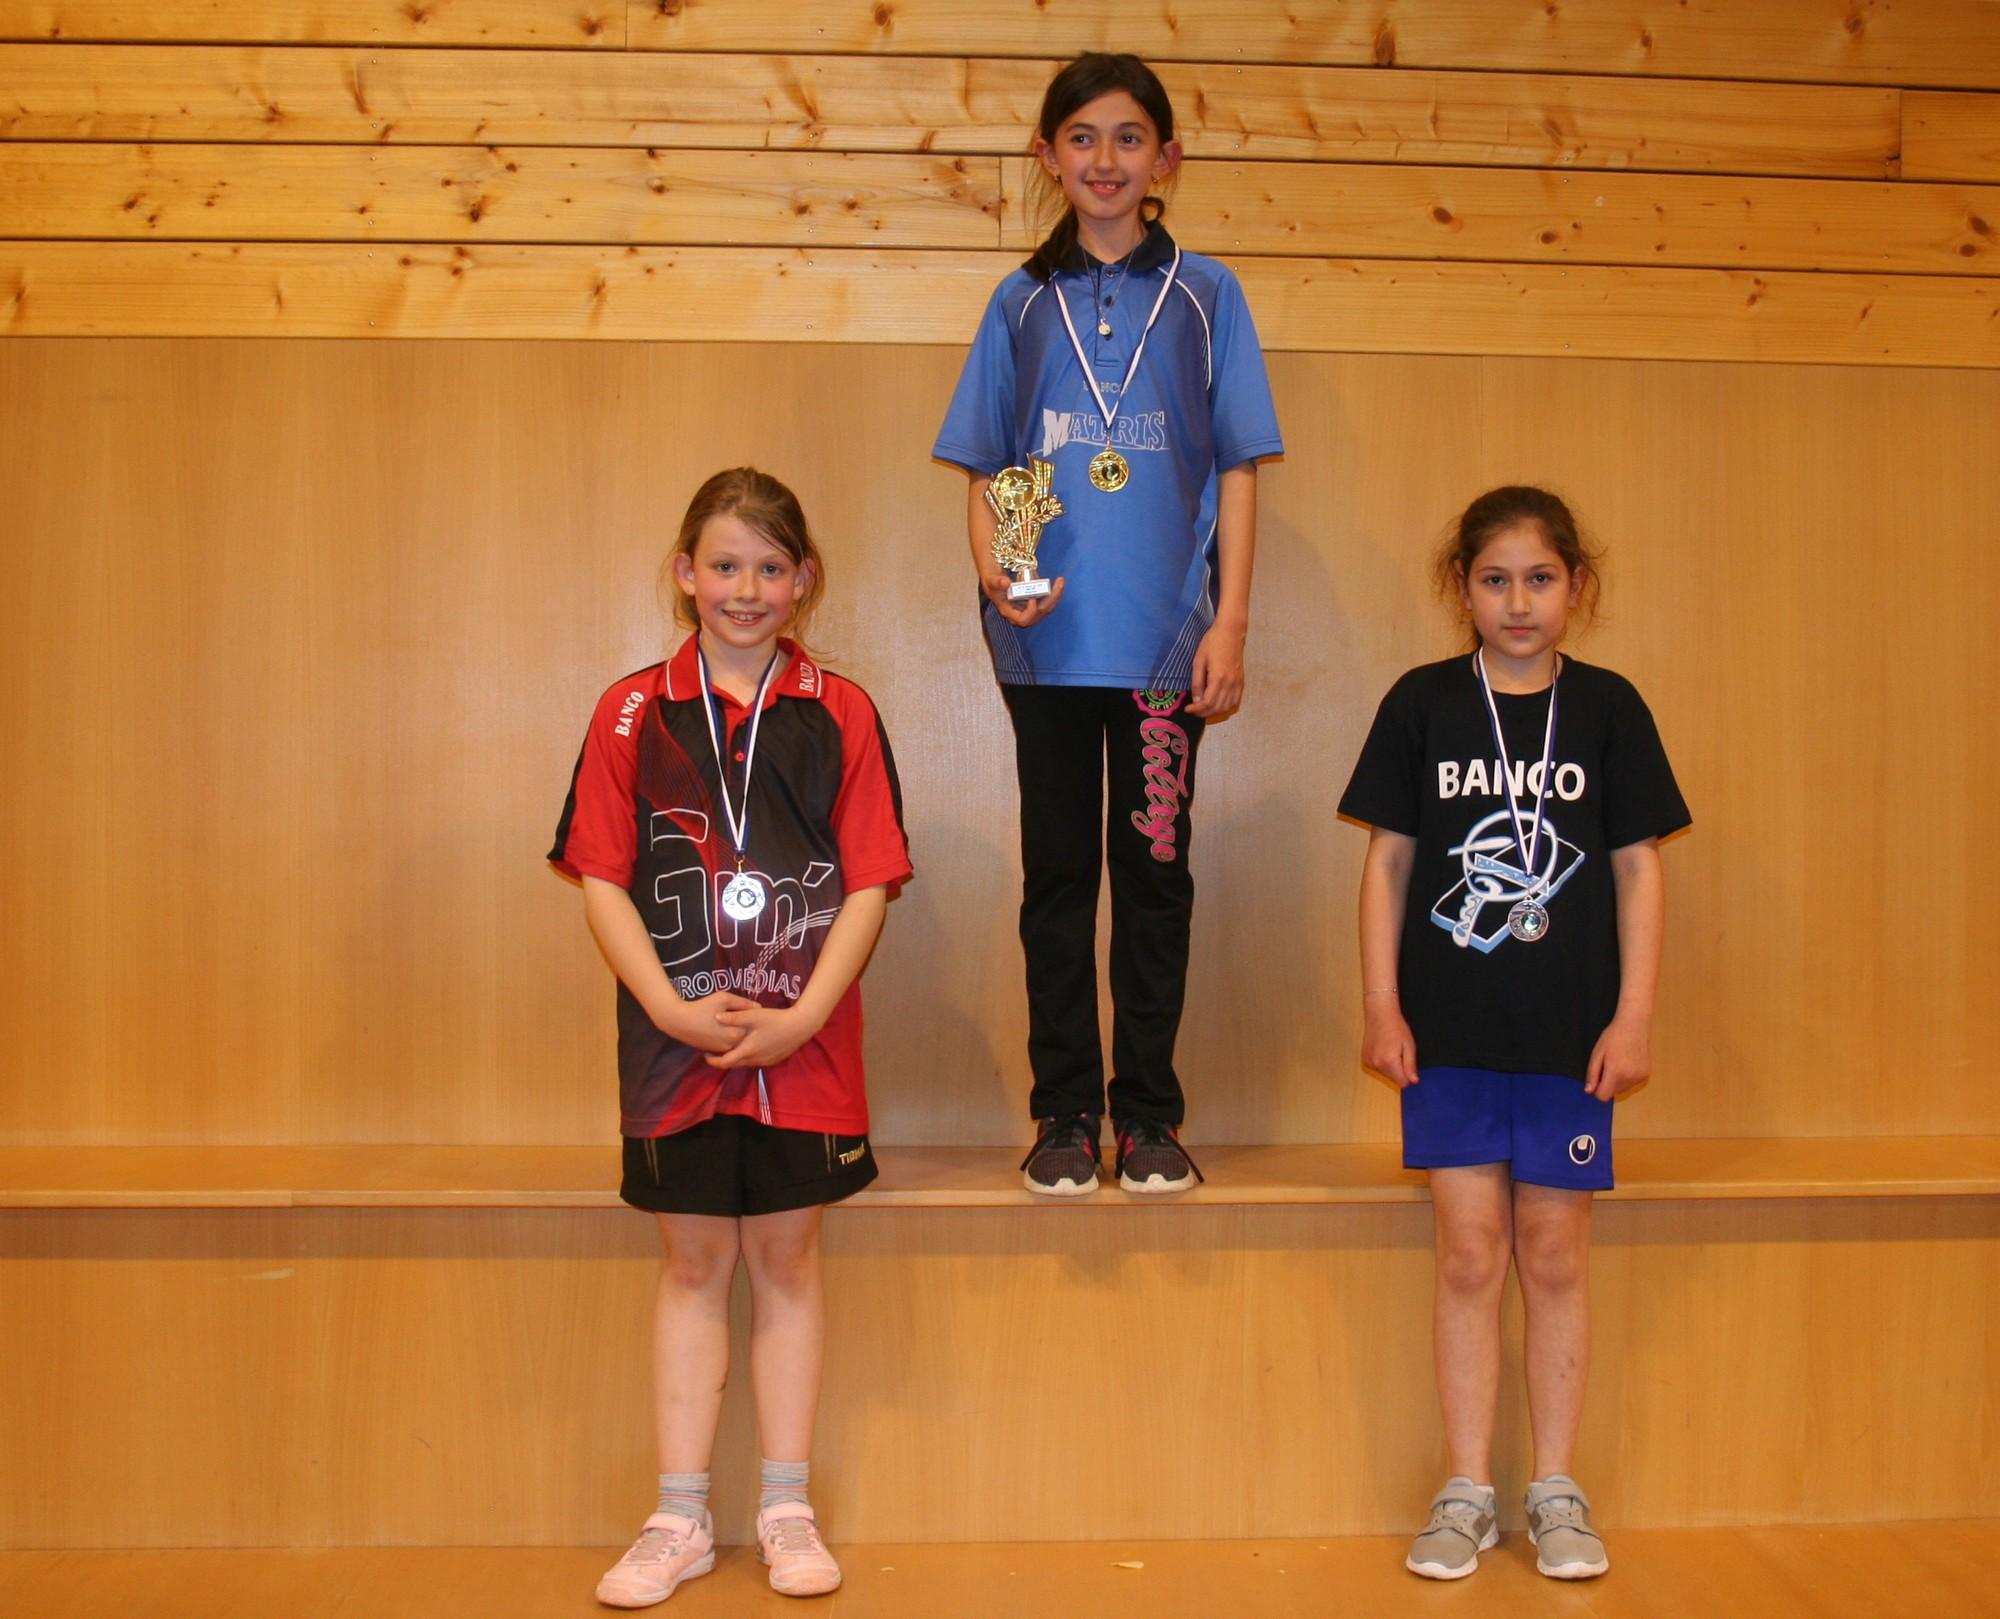 Chagny tennis de table resultats titres departementaux - Resultat tennis de table pro a ...